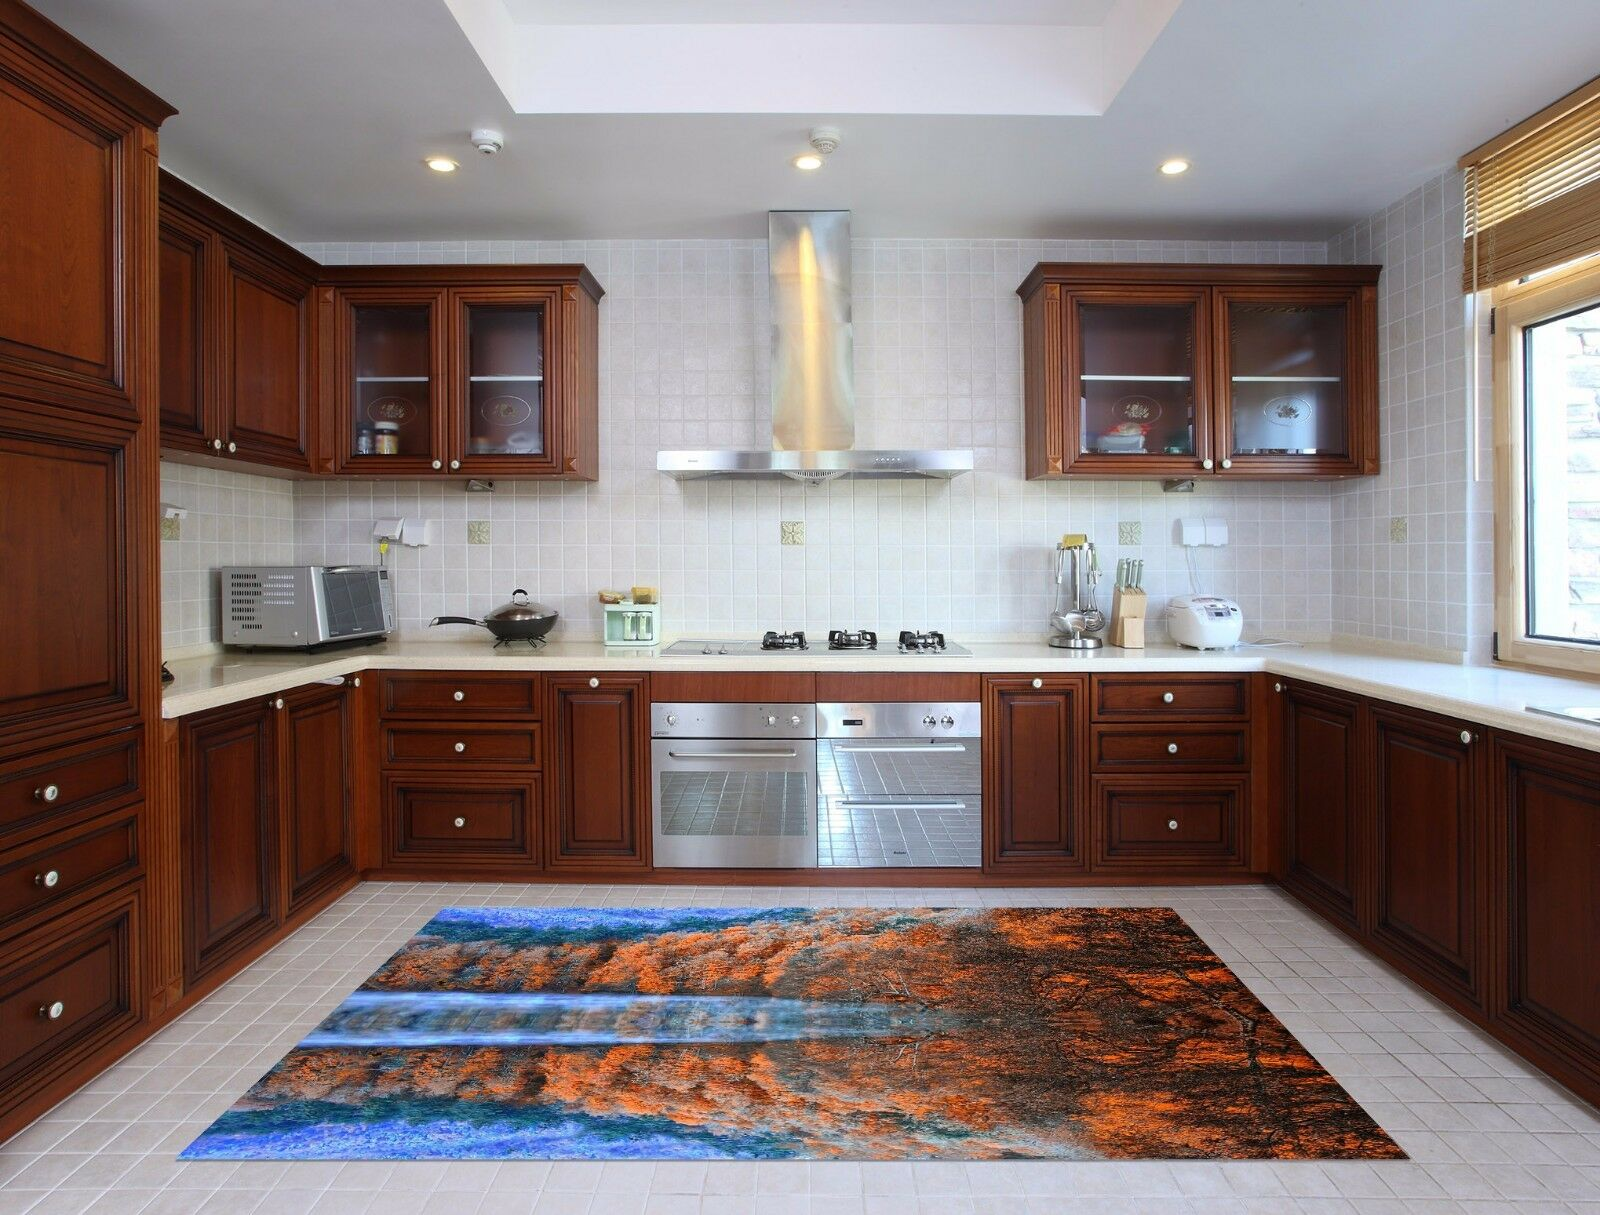 3D Woods Lakes 827 Kitchen Mat Floor Murals Wall Print Wall AJ WALLPAPER AU Kyra